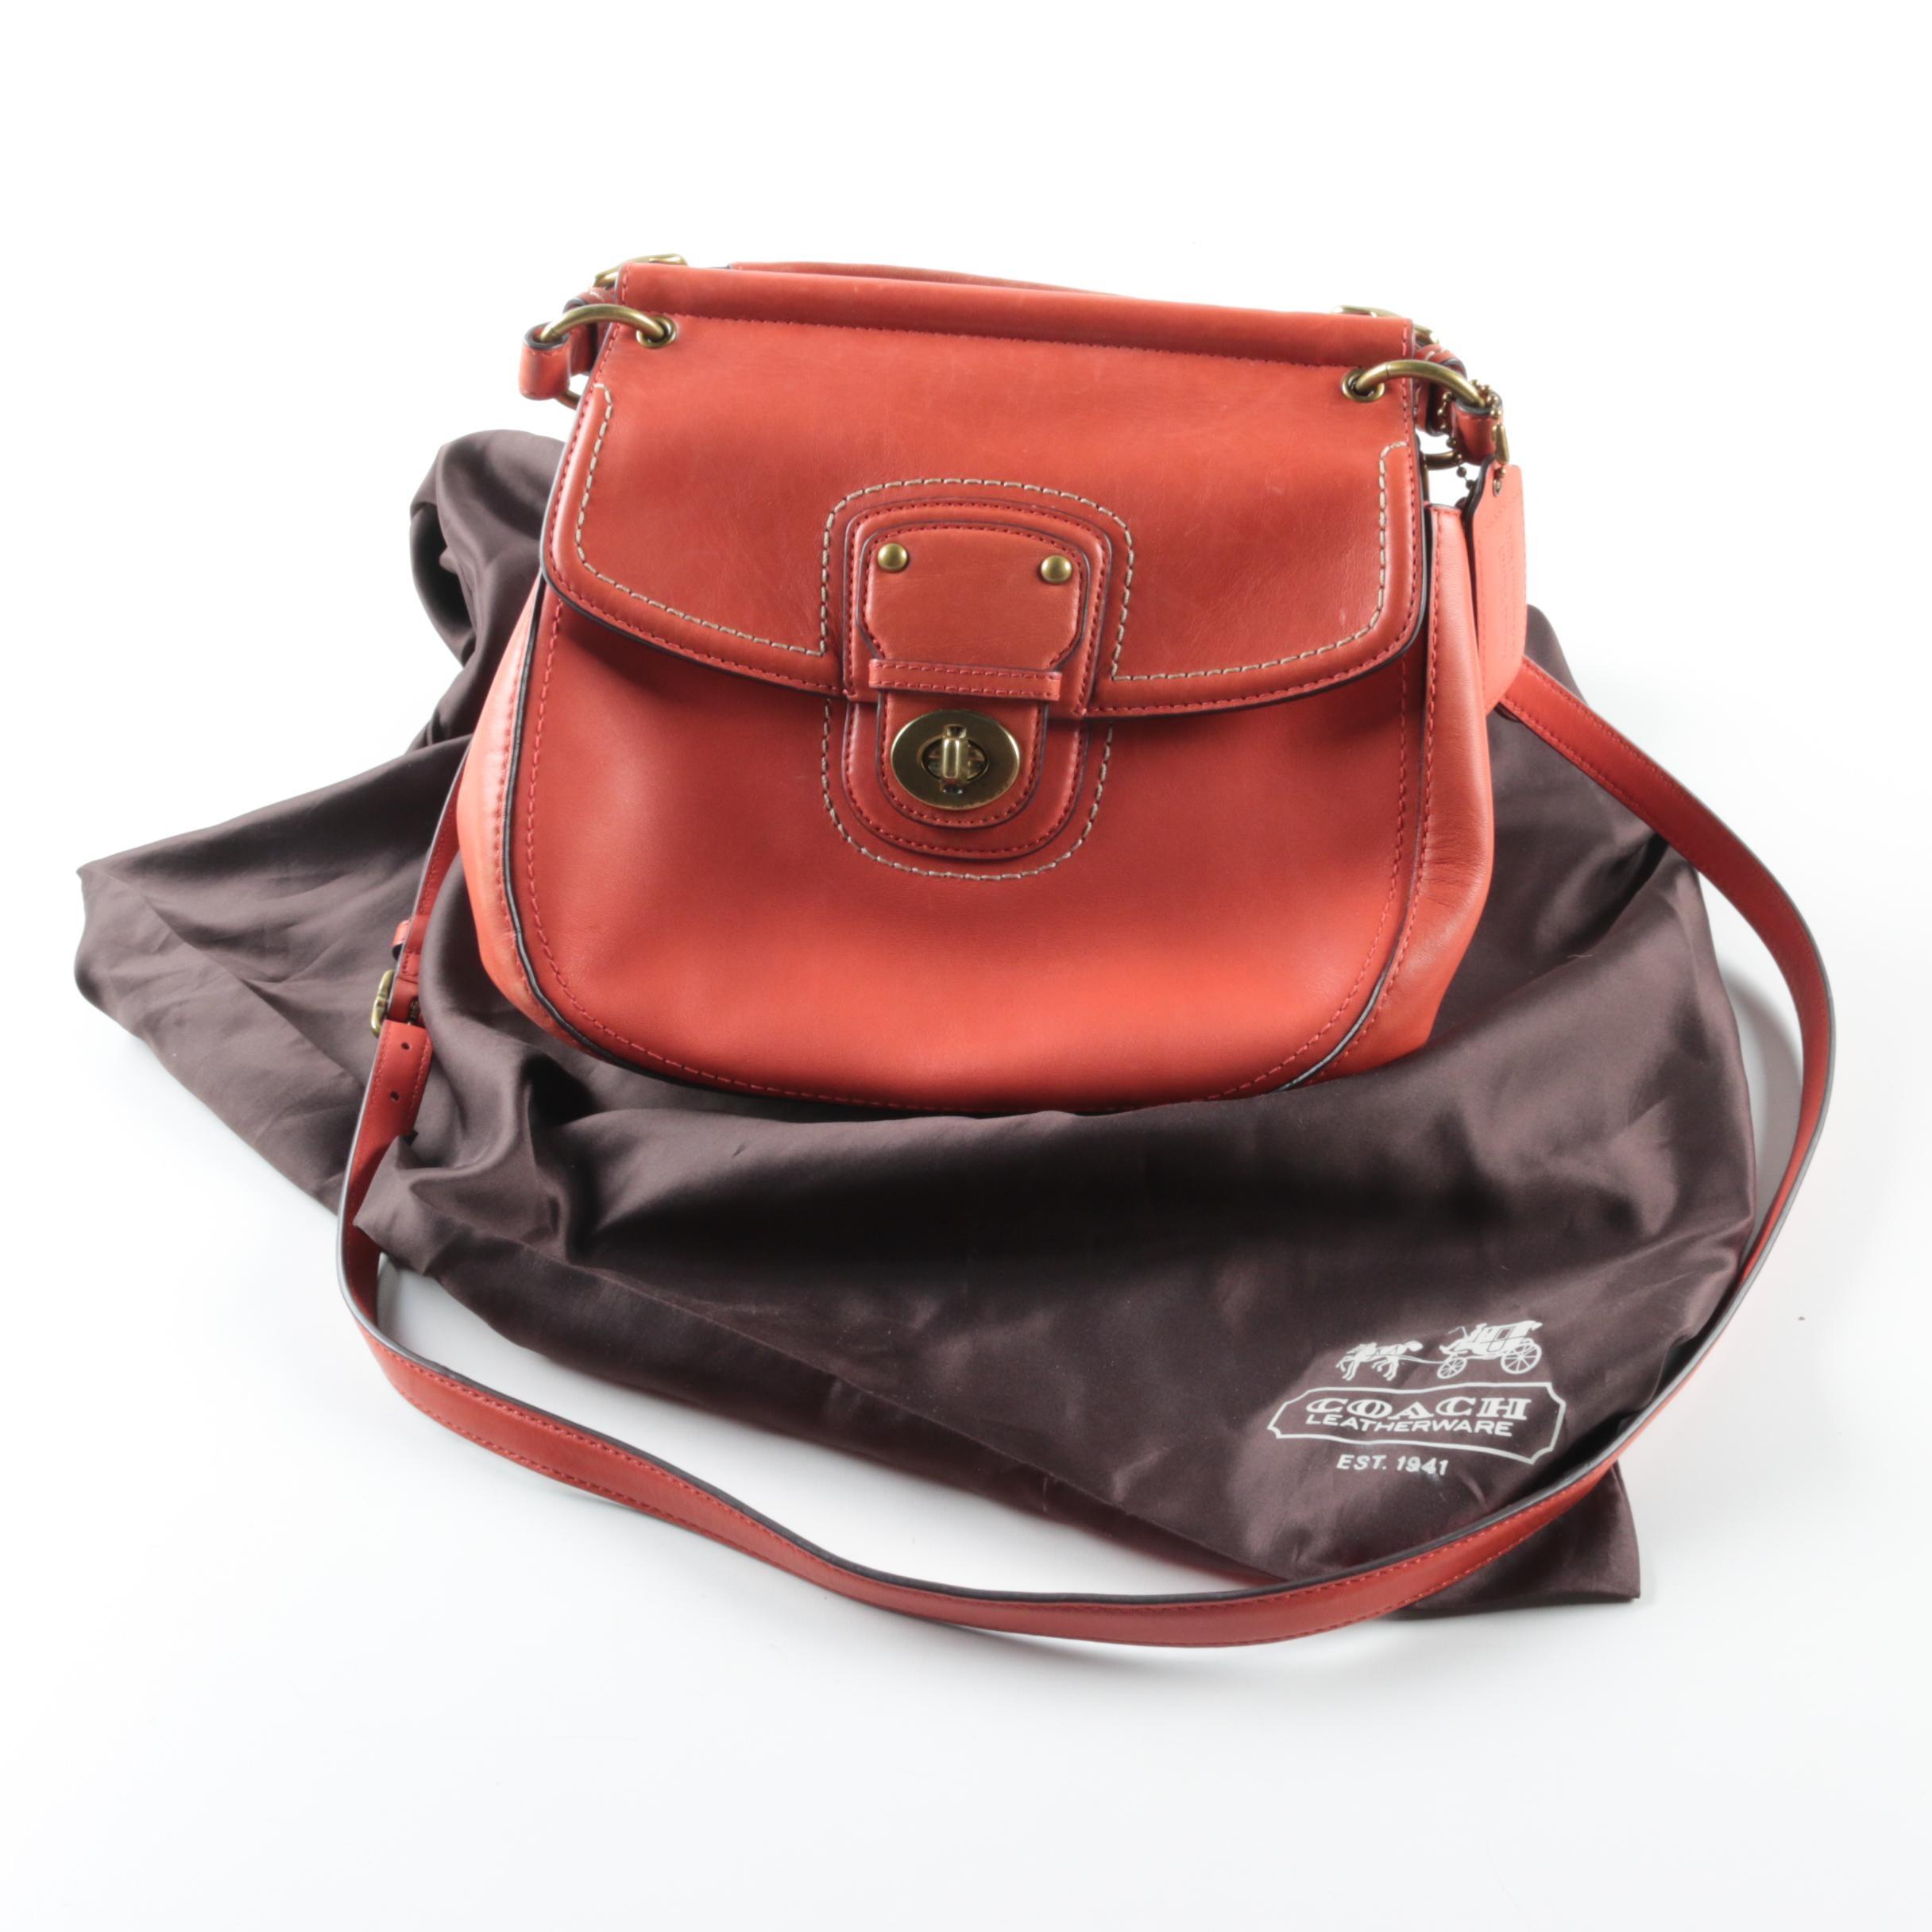 Coach 70th Anniversary Vermillion Leather New Willis Crossbody Handbag